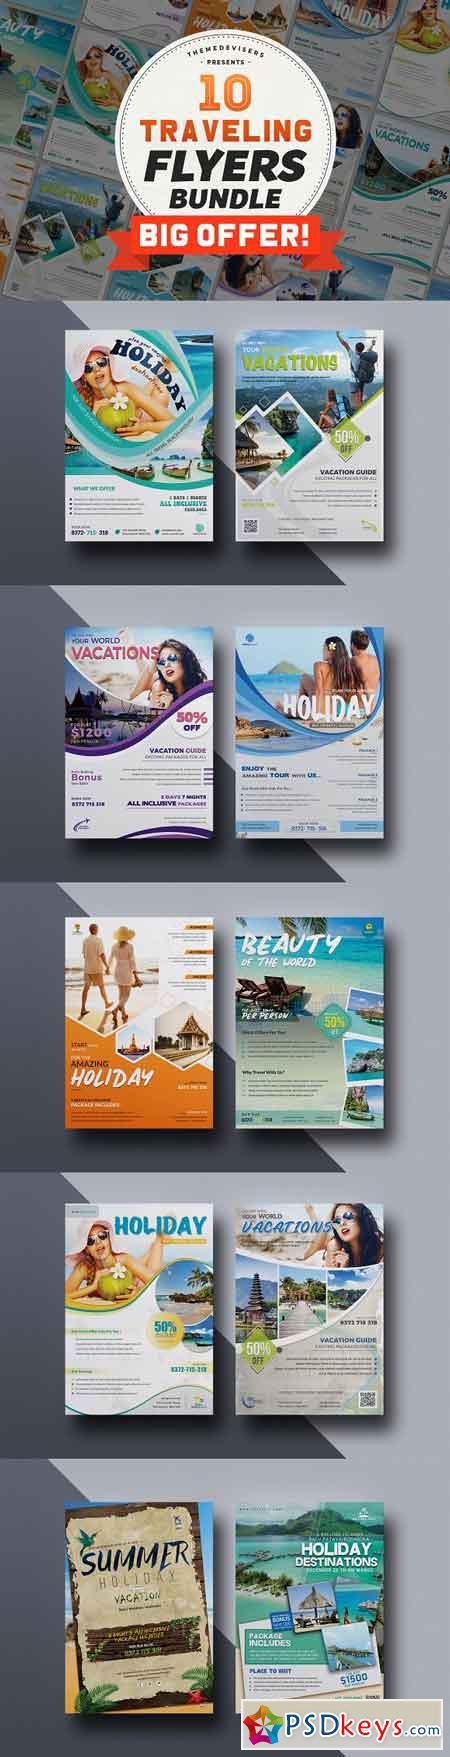 Travel & Tour Agency Flyer Bundle 3115293